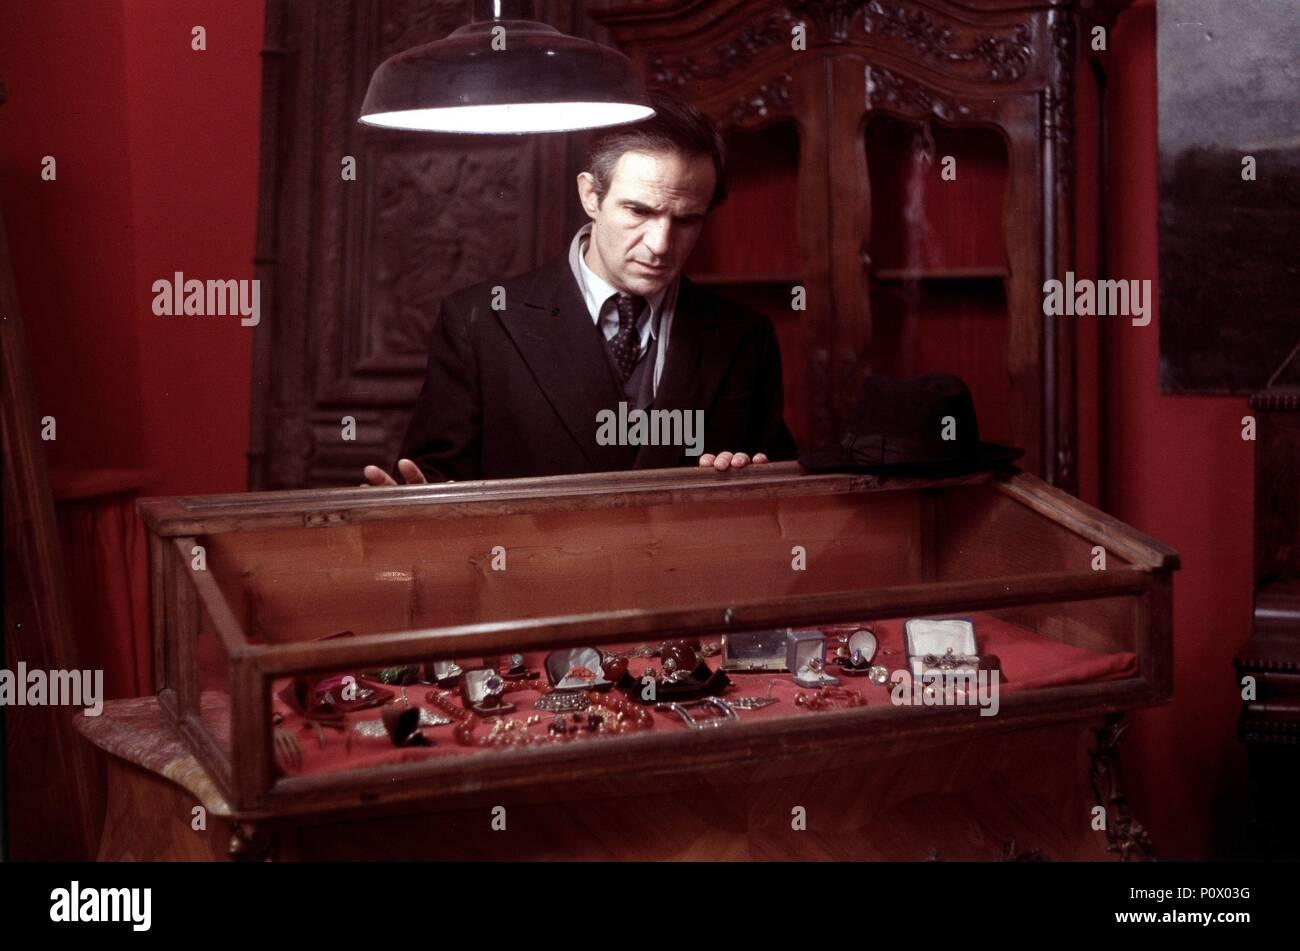 Truffaut Films Stock Photos & Truffaut Films Stock Images - Alamy